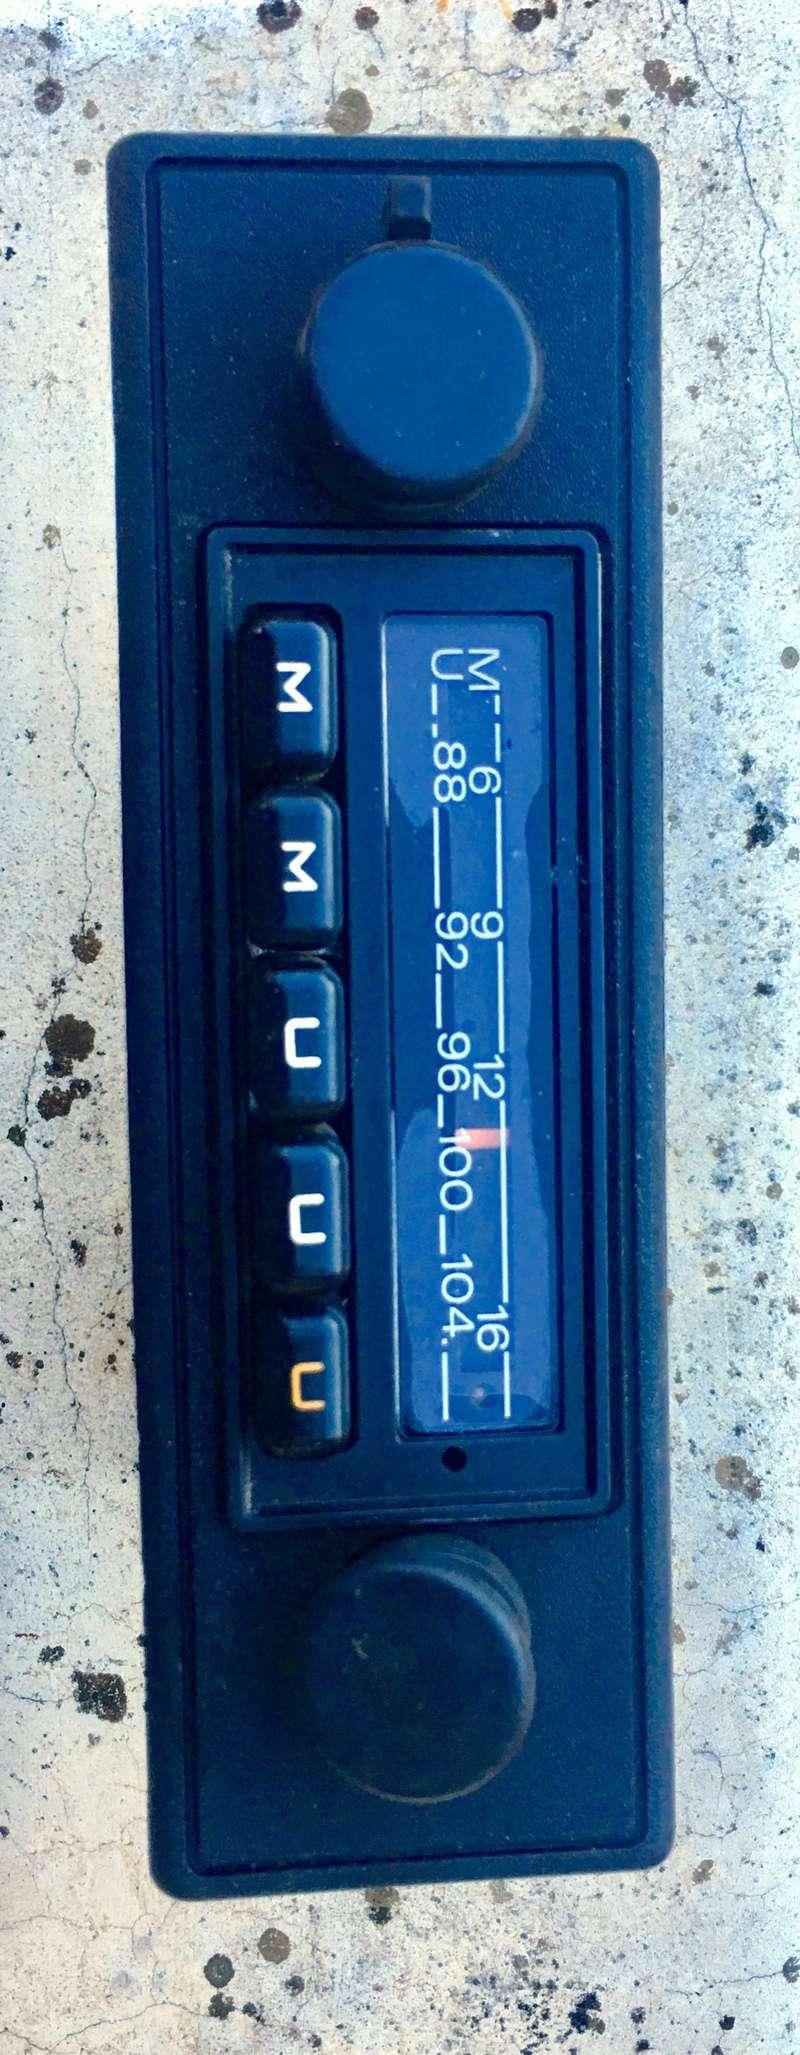 Radio Grundig Autosuper Emden 7 Ee147d10